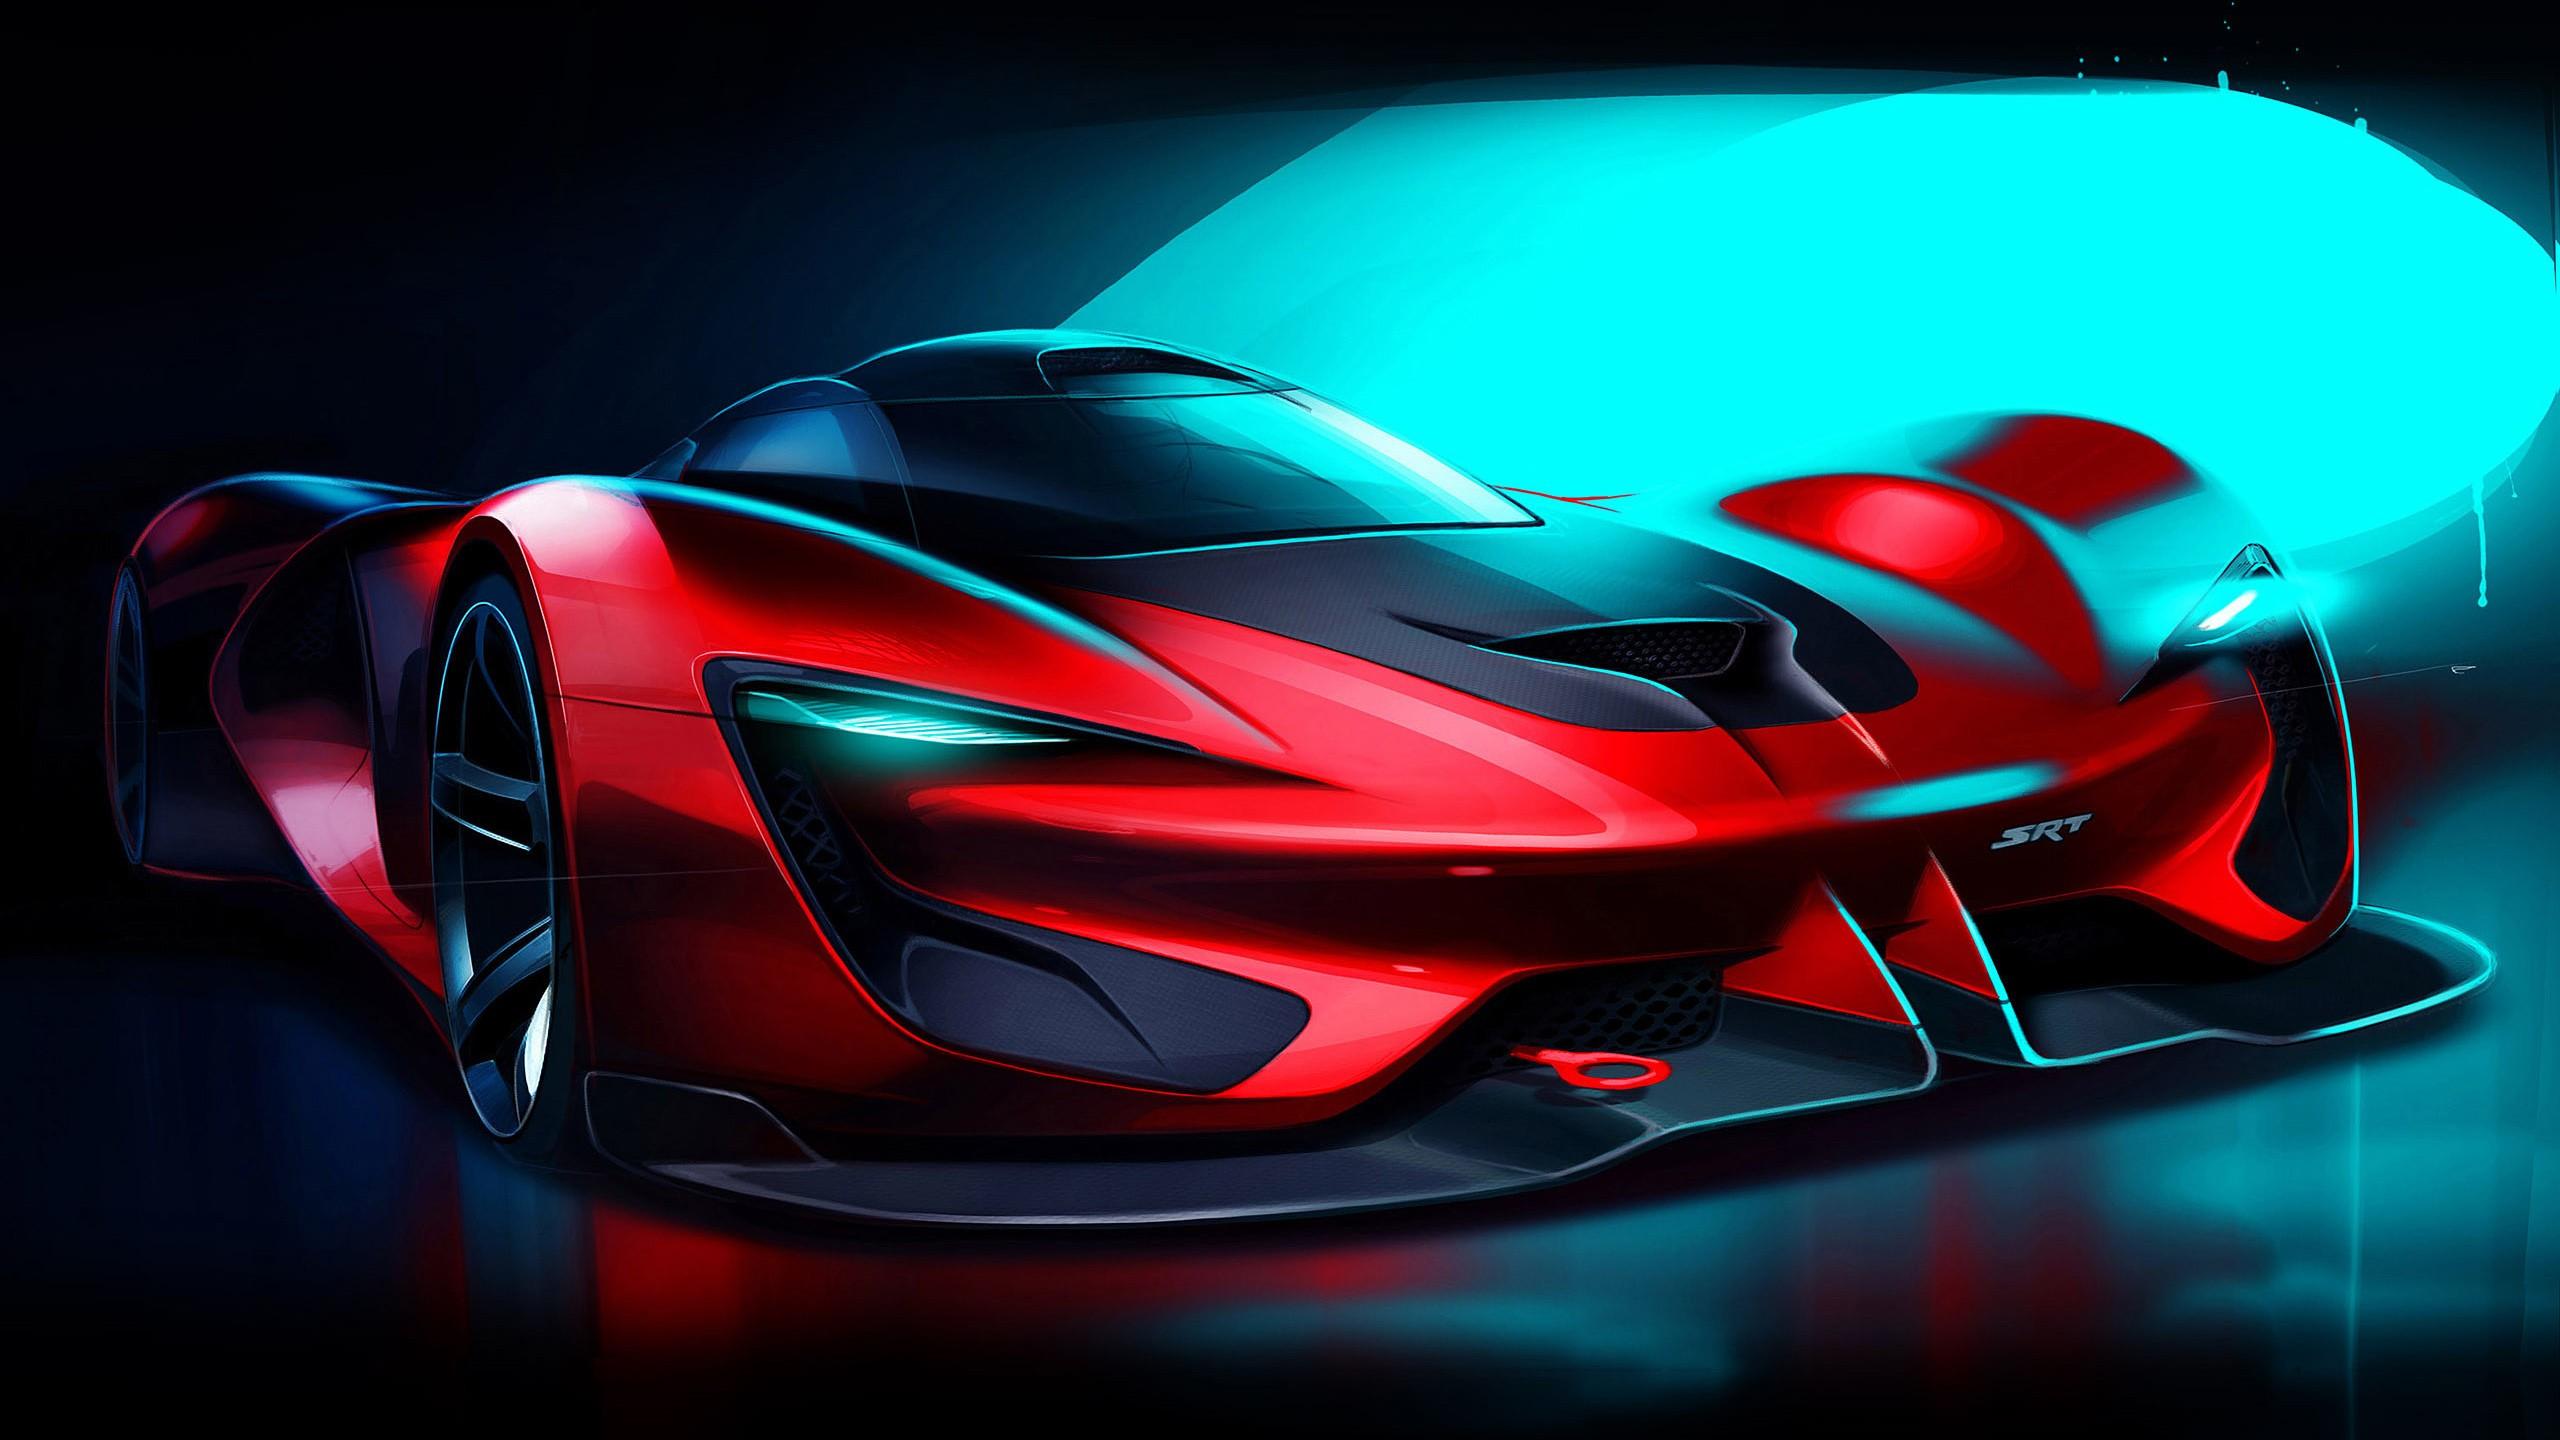 2015 Dodge SRT Tomahawk 2 Wallpaper | HD Car Wallpapers ...